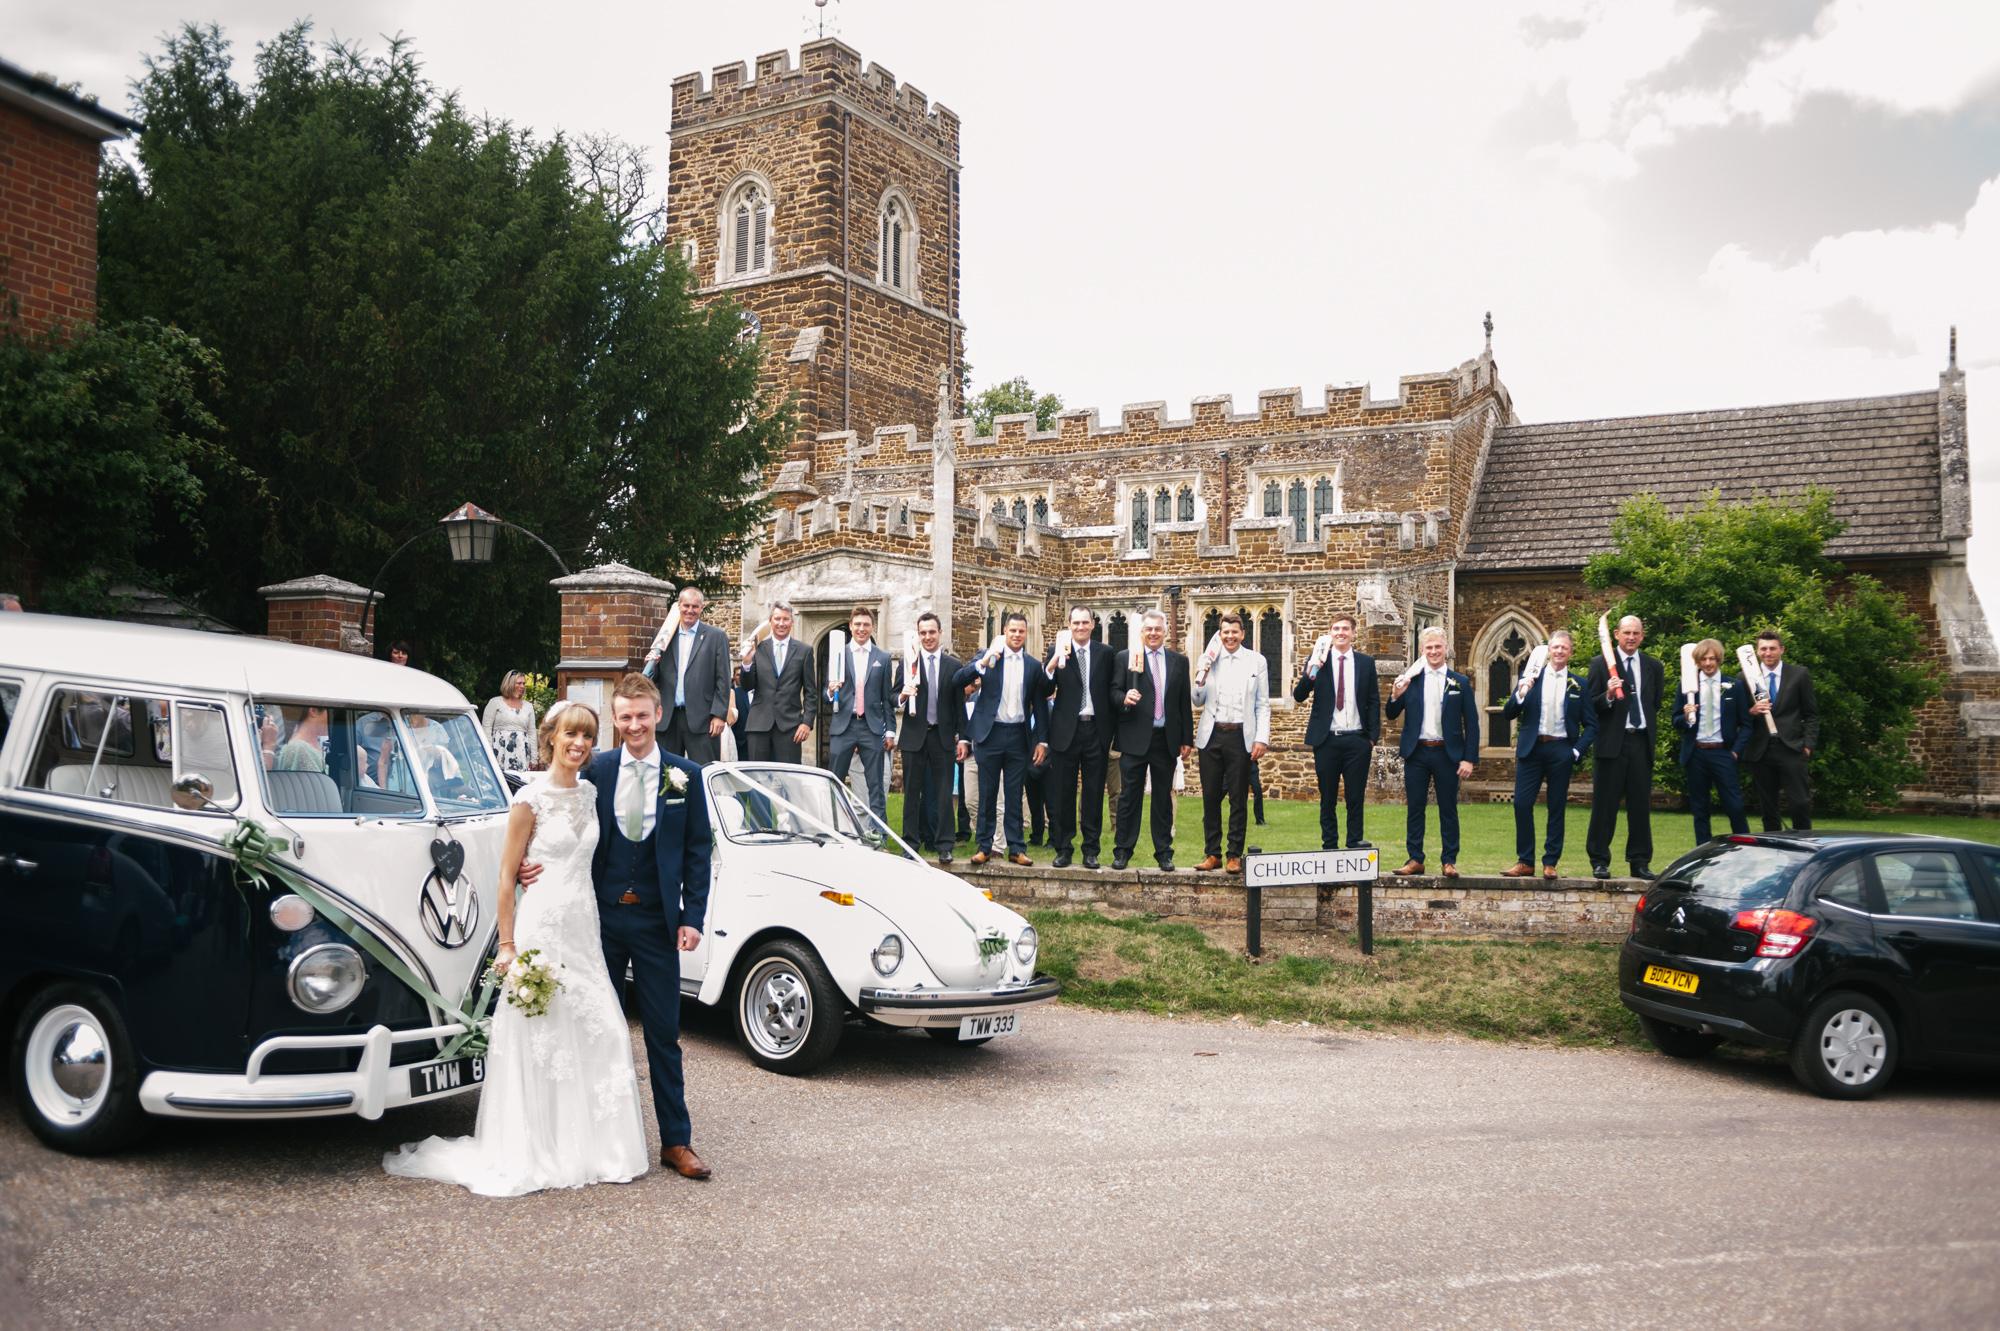 Cricket Club Wedding Tea Party Eversholt Bedfordshire-38